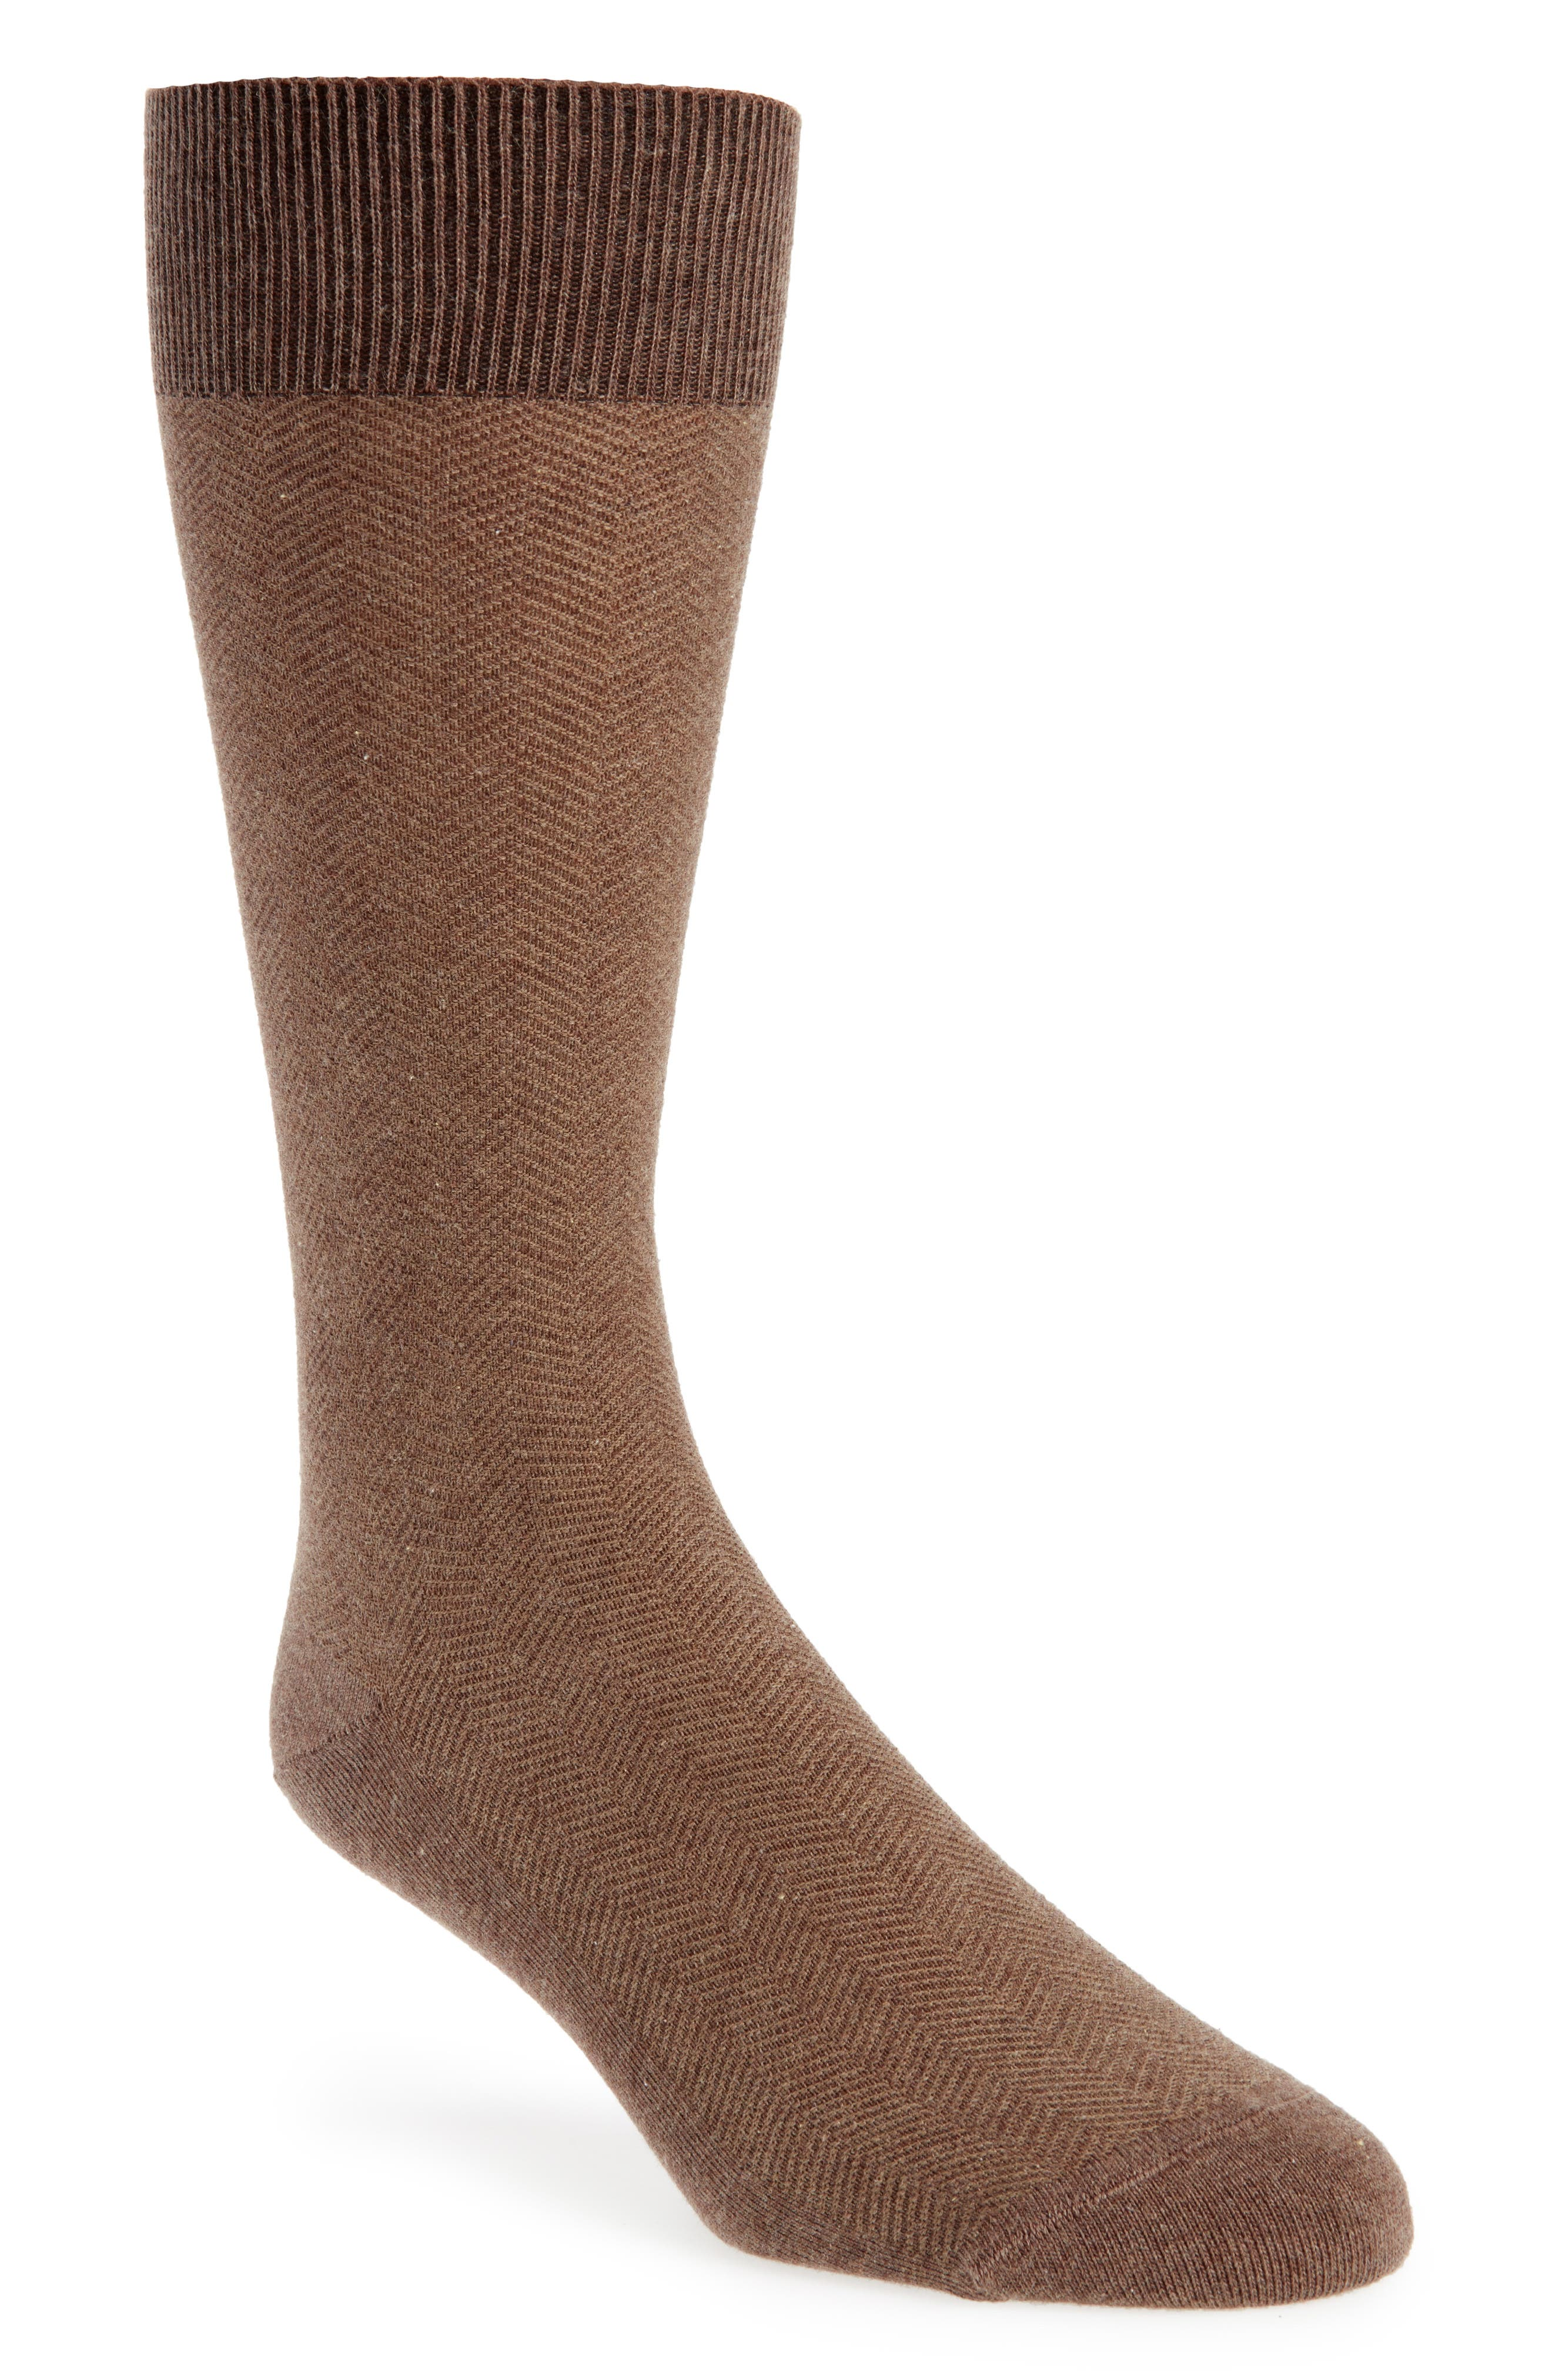 Herringbone Texture Crew Socks,                             Main thumbnail 1, color,                             BROWN HEATHER